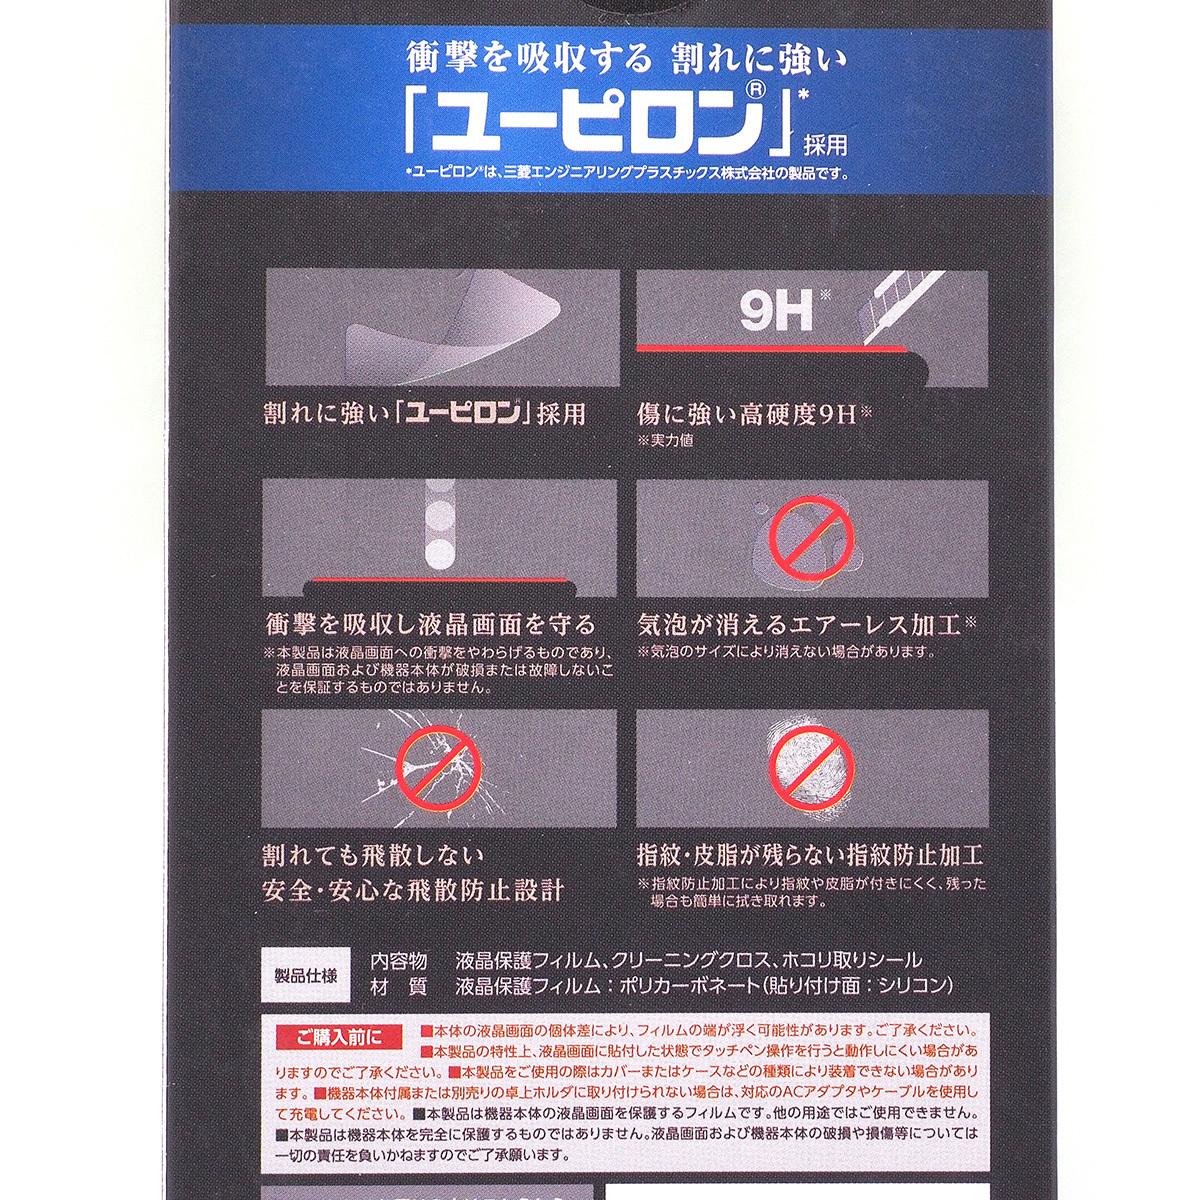 SHARP AQUOS R2 (Softbank / au SHV42 / docomo SH-03K) 用 ユーピロン 衝撃吸収 液晶保護フィルム 未開封品 シャープ AquosR2フィルム_画像3